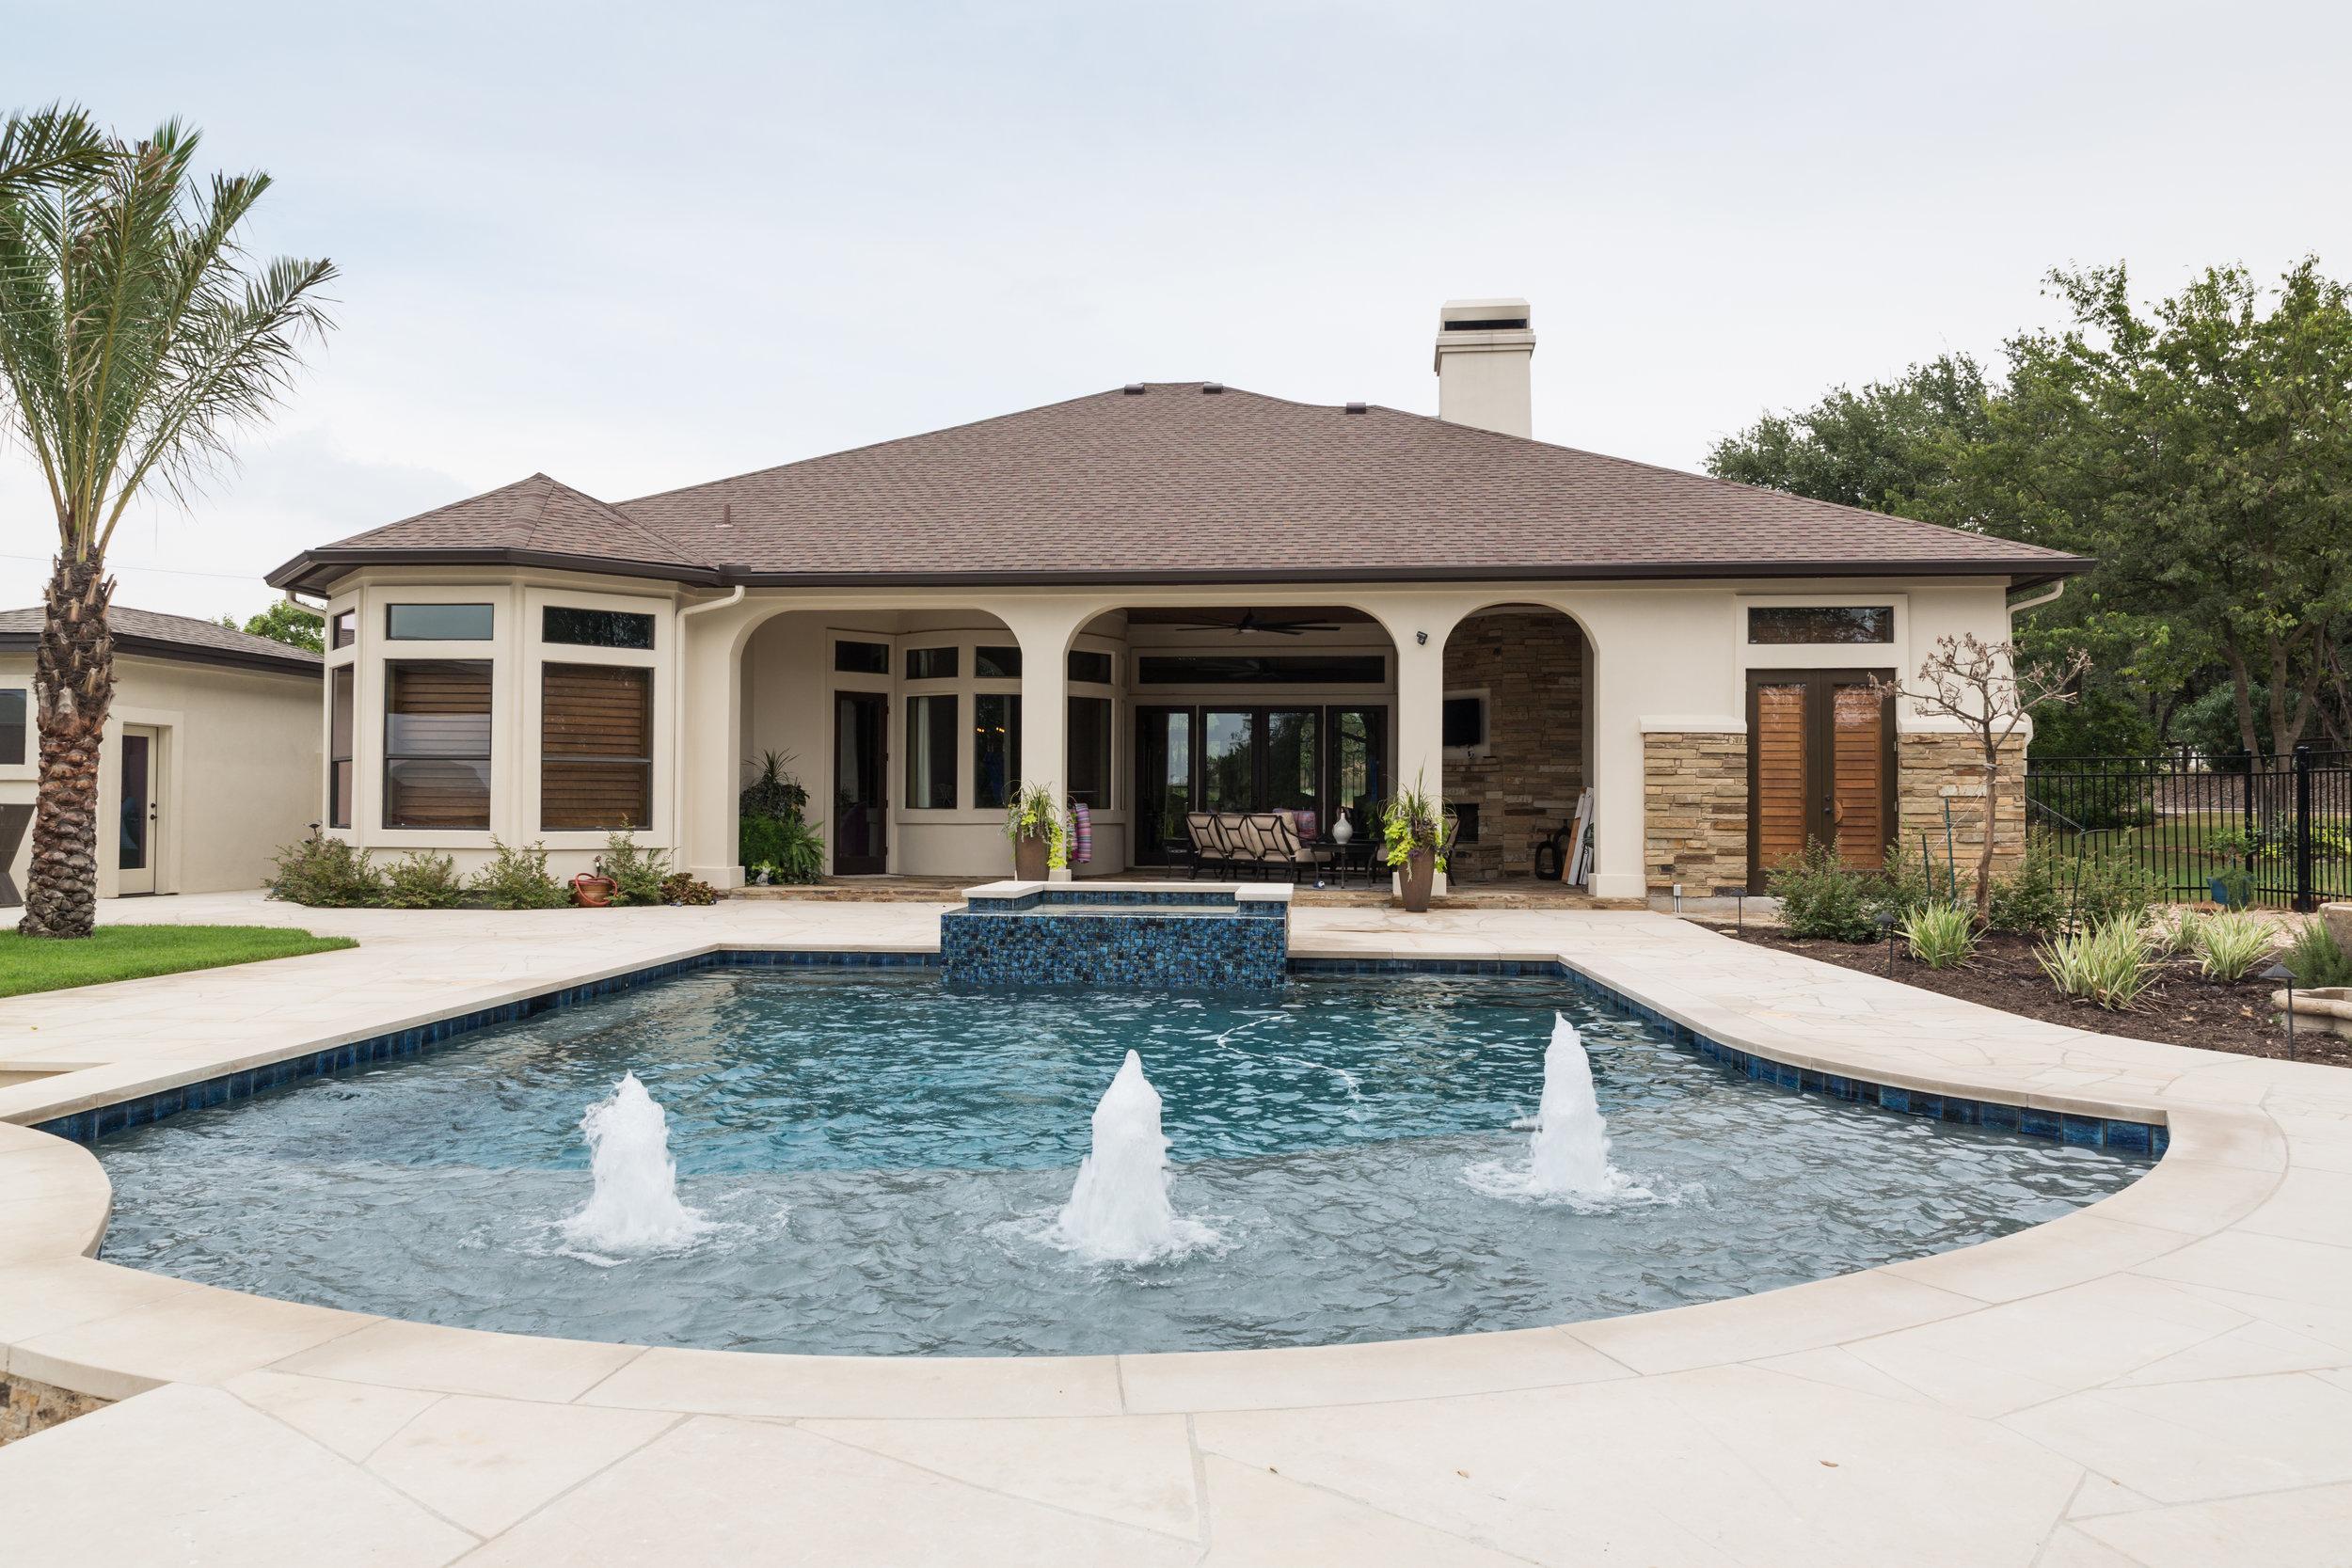 Backyard Pool with Hot Tub